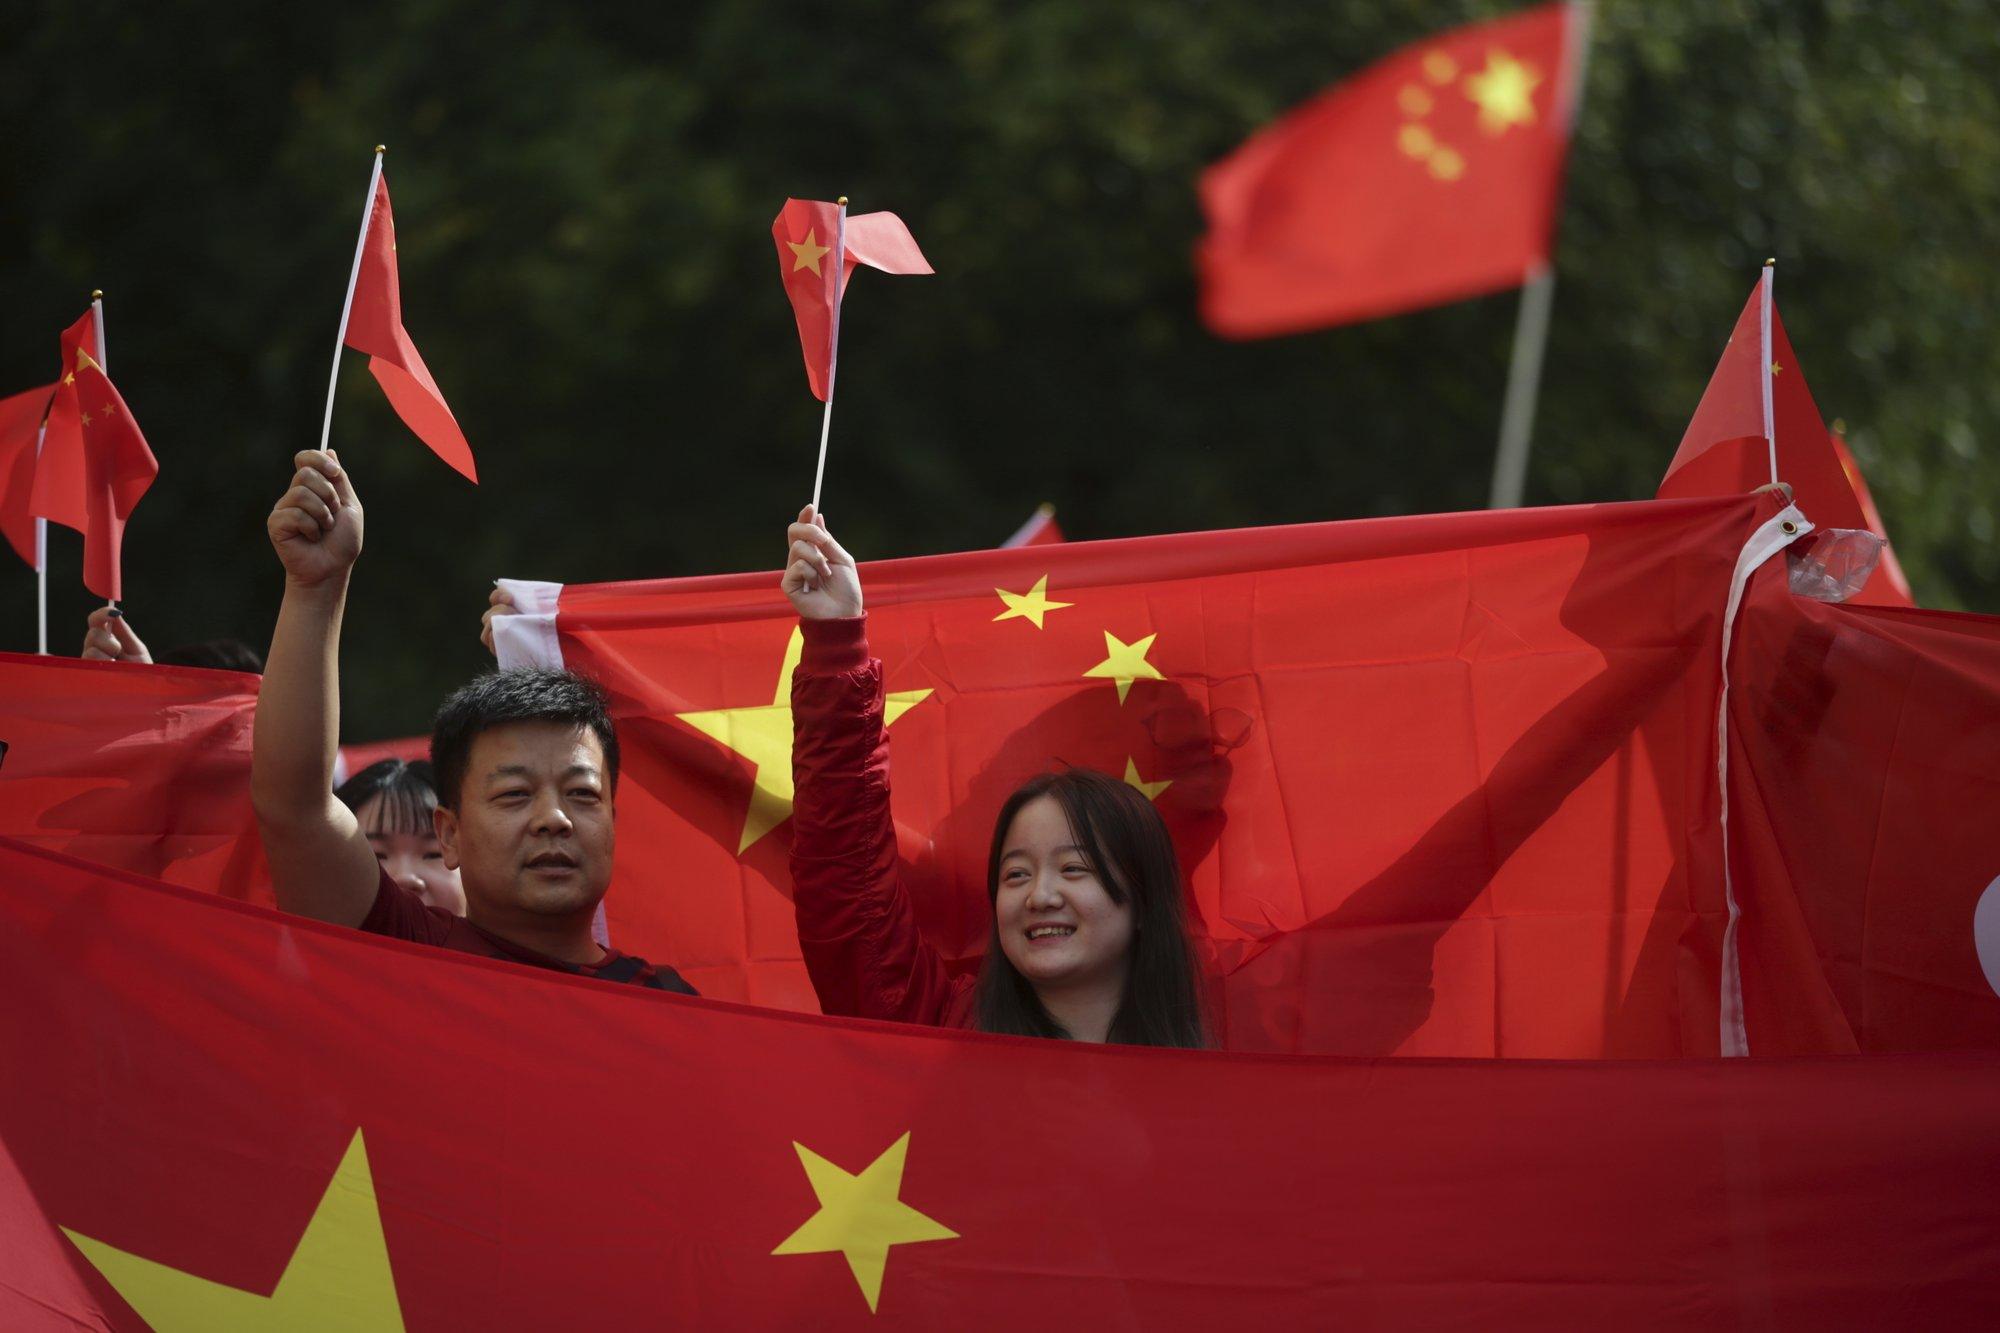 China ties shape cautious reaction to Hong Kong protests